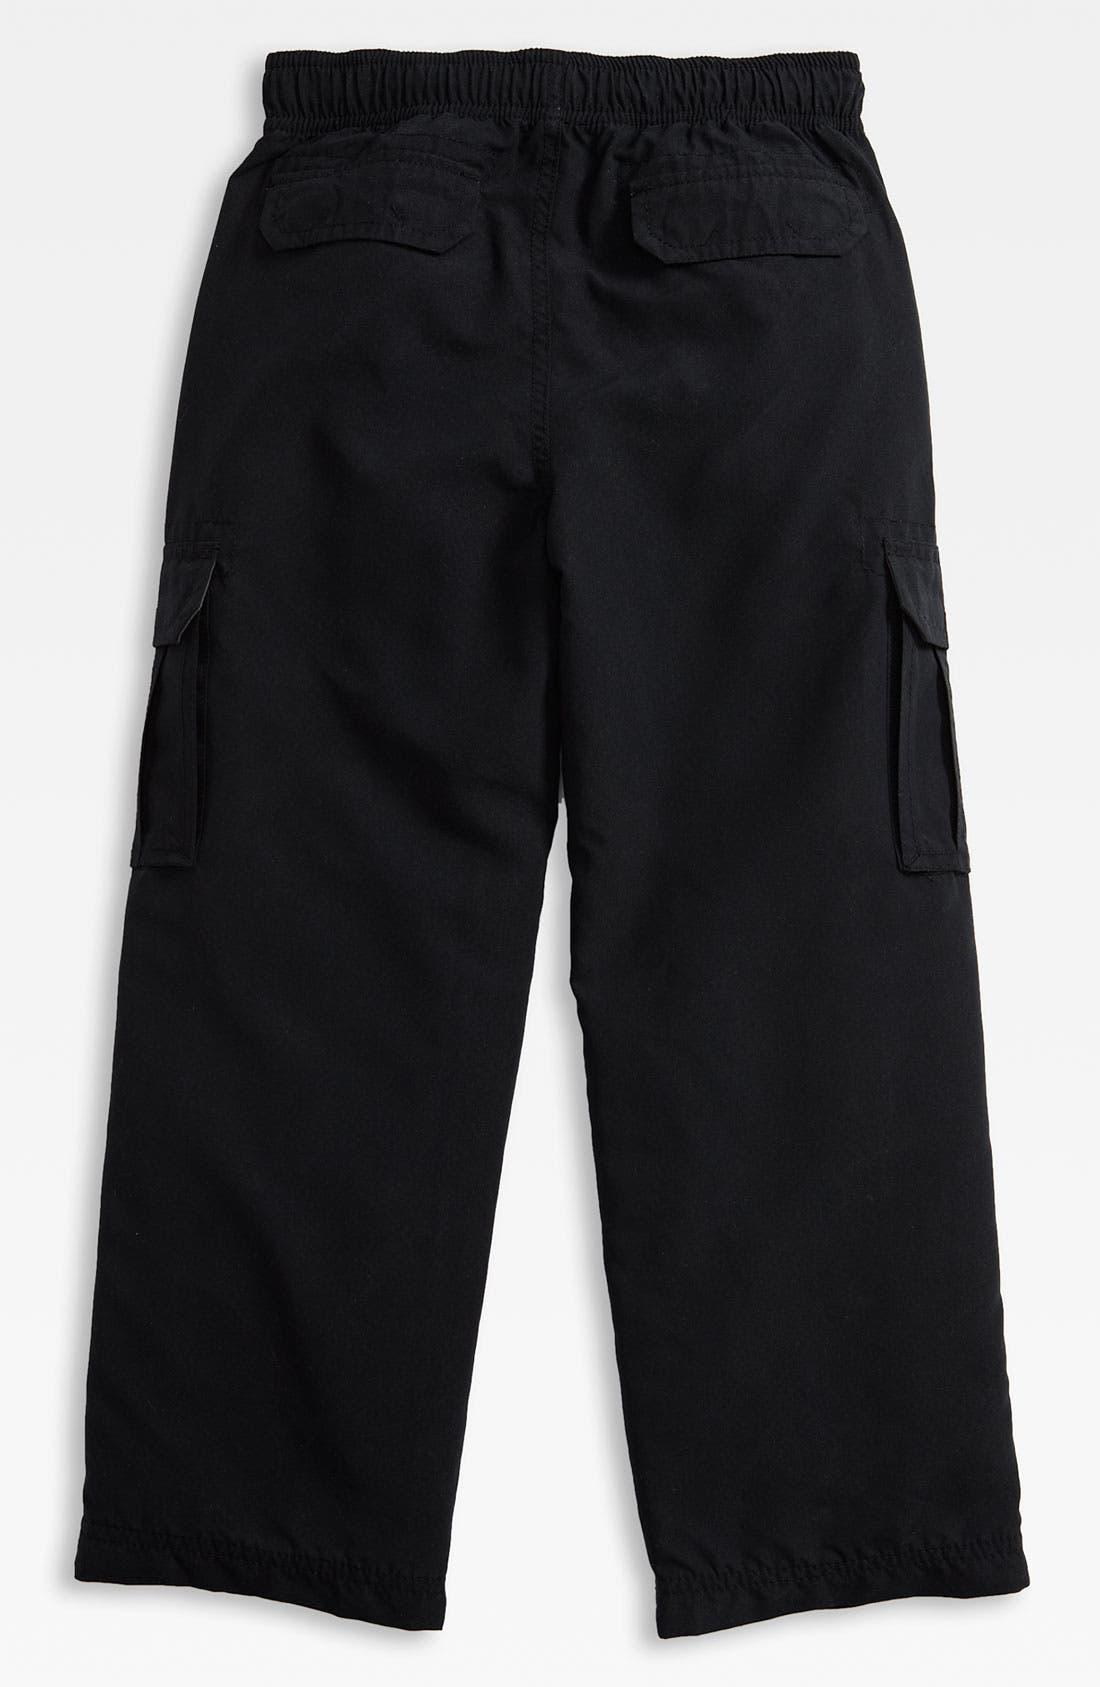 Alternate Image 1 Selected - Pure Stuff 'Summit' Pants (Big Boys)